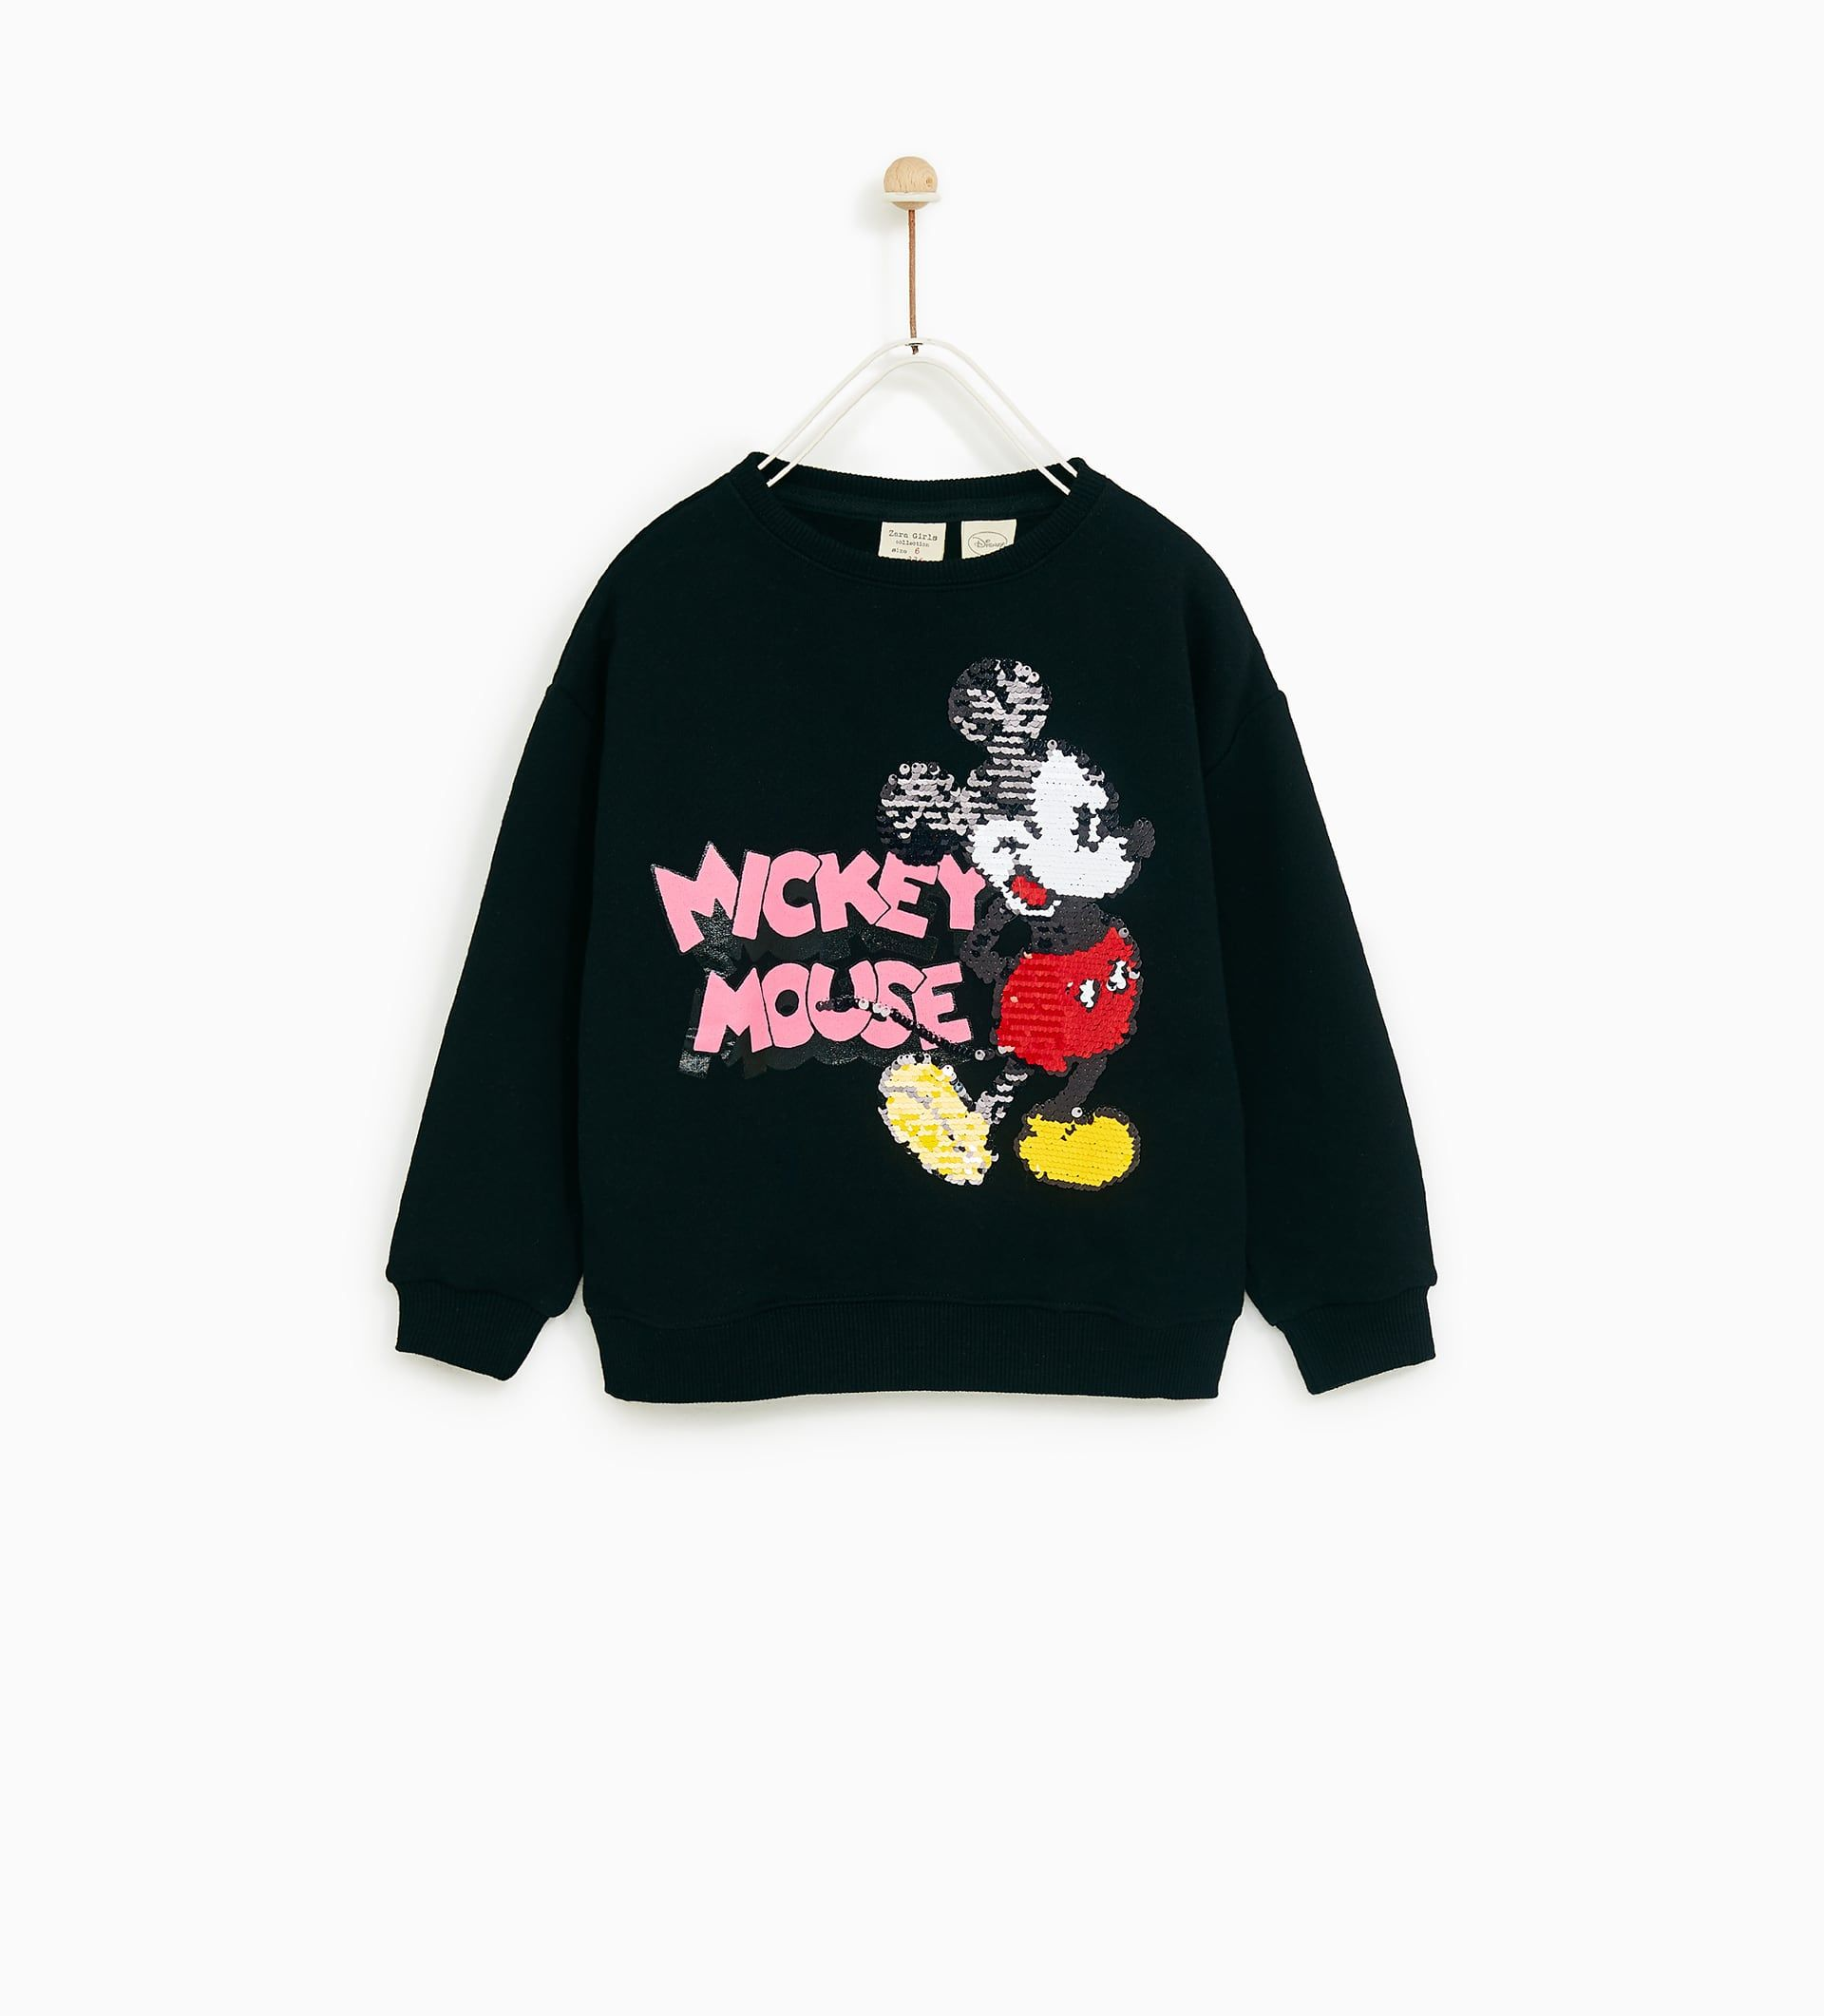 Sudadera Lentejuelas Dobles Mickey Mouse Sweatshirts Sequined Sweatshirt Baby Girl Sweatshirt